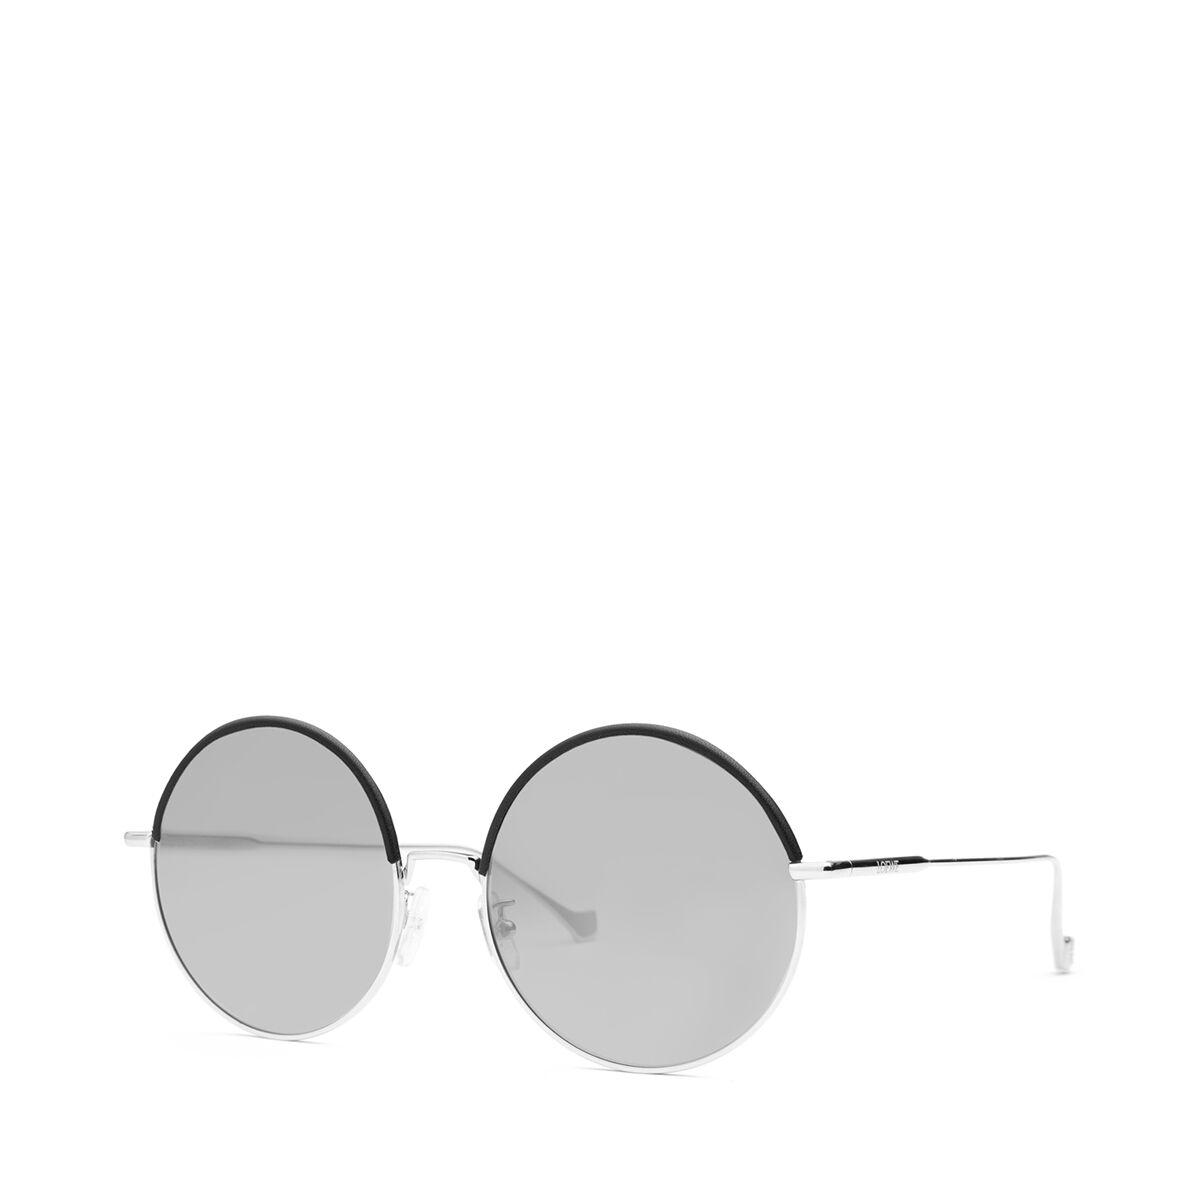 LOEWE Gafas Redondas Negro/Humo Degradado front